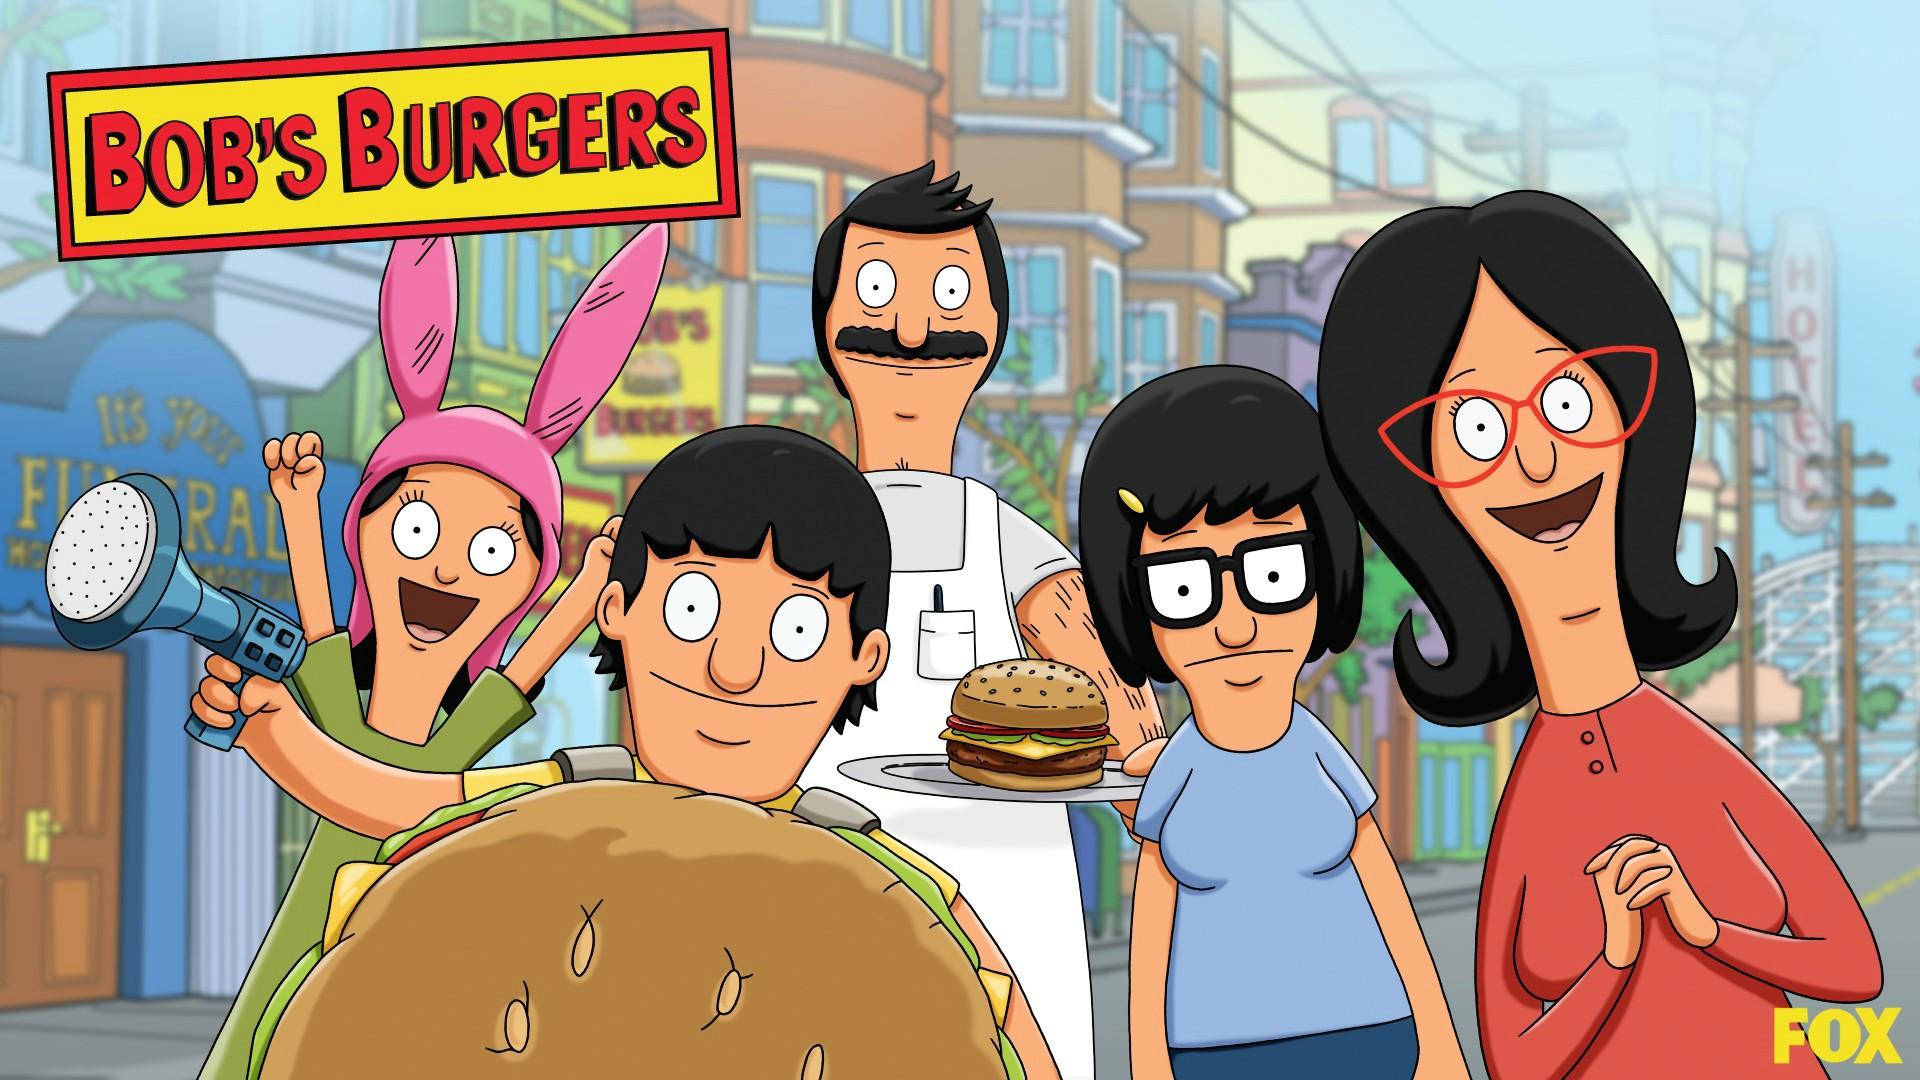 Bob's Burgers HD Wallpaper | Background Image | 1920x1080 ...